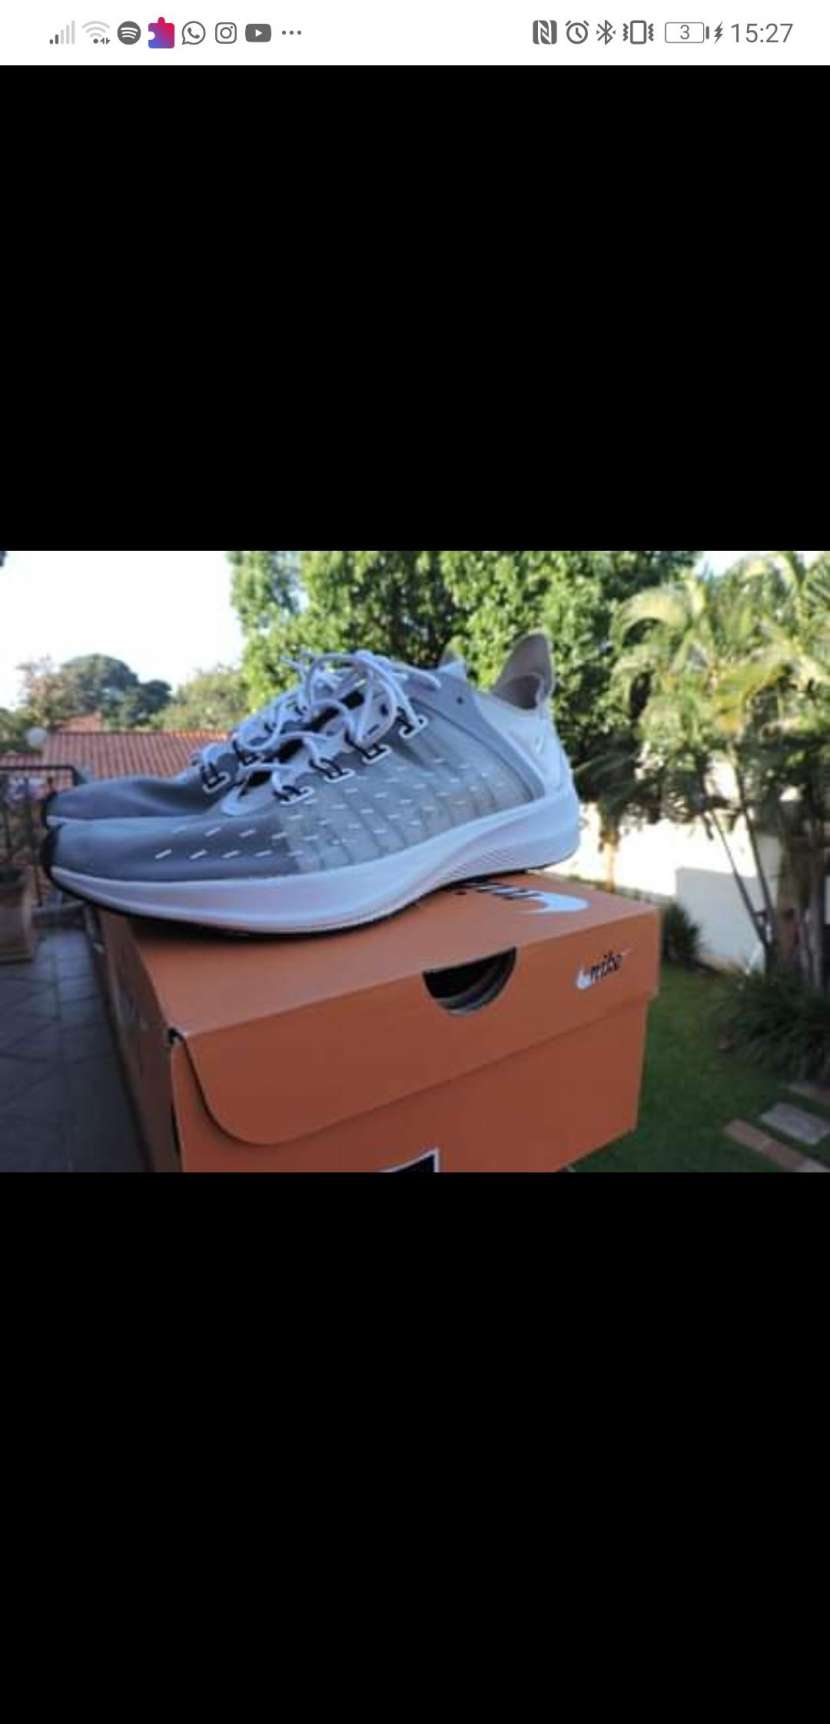 Calzado Nike EXP-7 Running 9.5 - 1